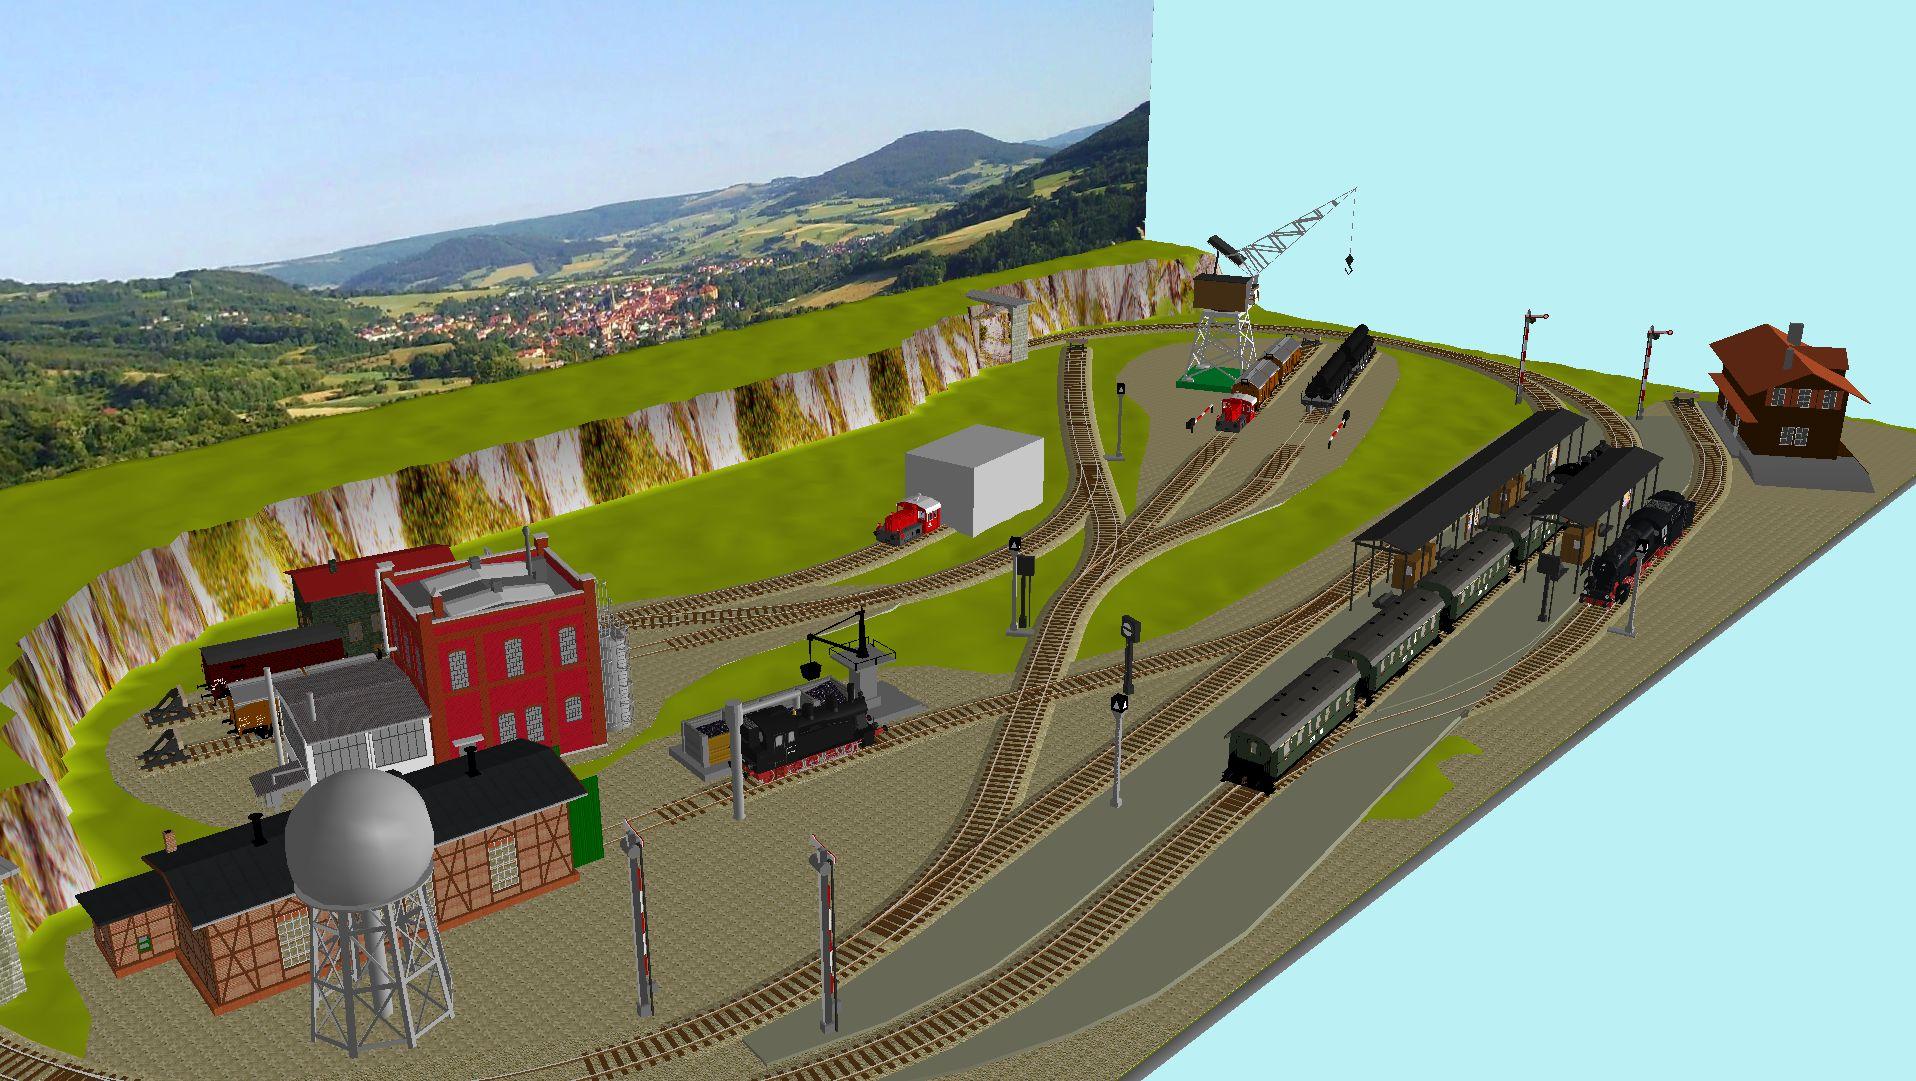 'ALBA Modellbahnpraxis' Band 1, Plan 5 Amp-1_5_m-gleis_jrg_amojdr